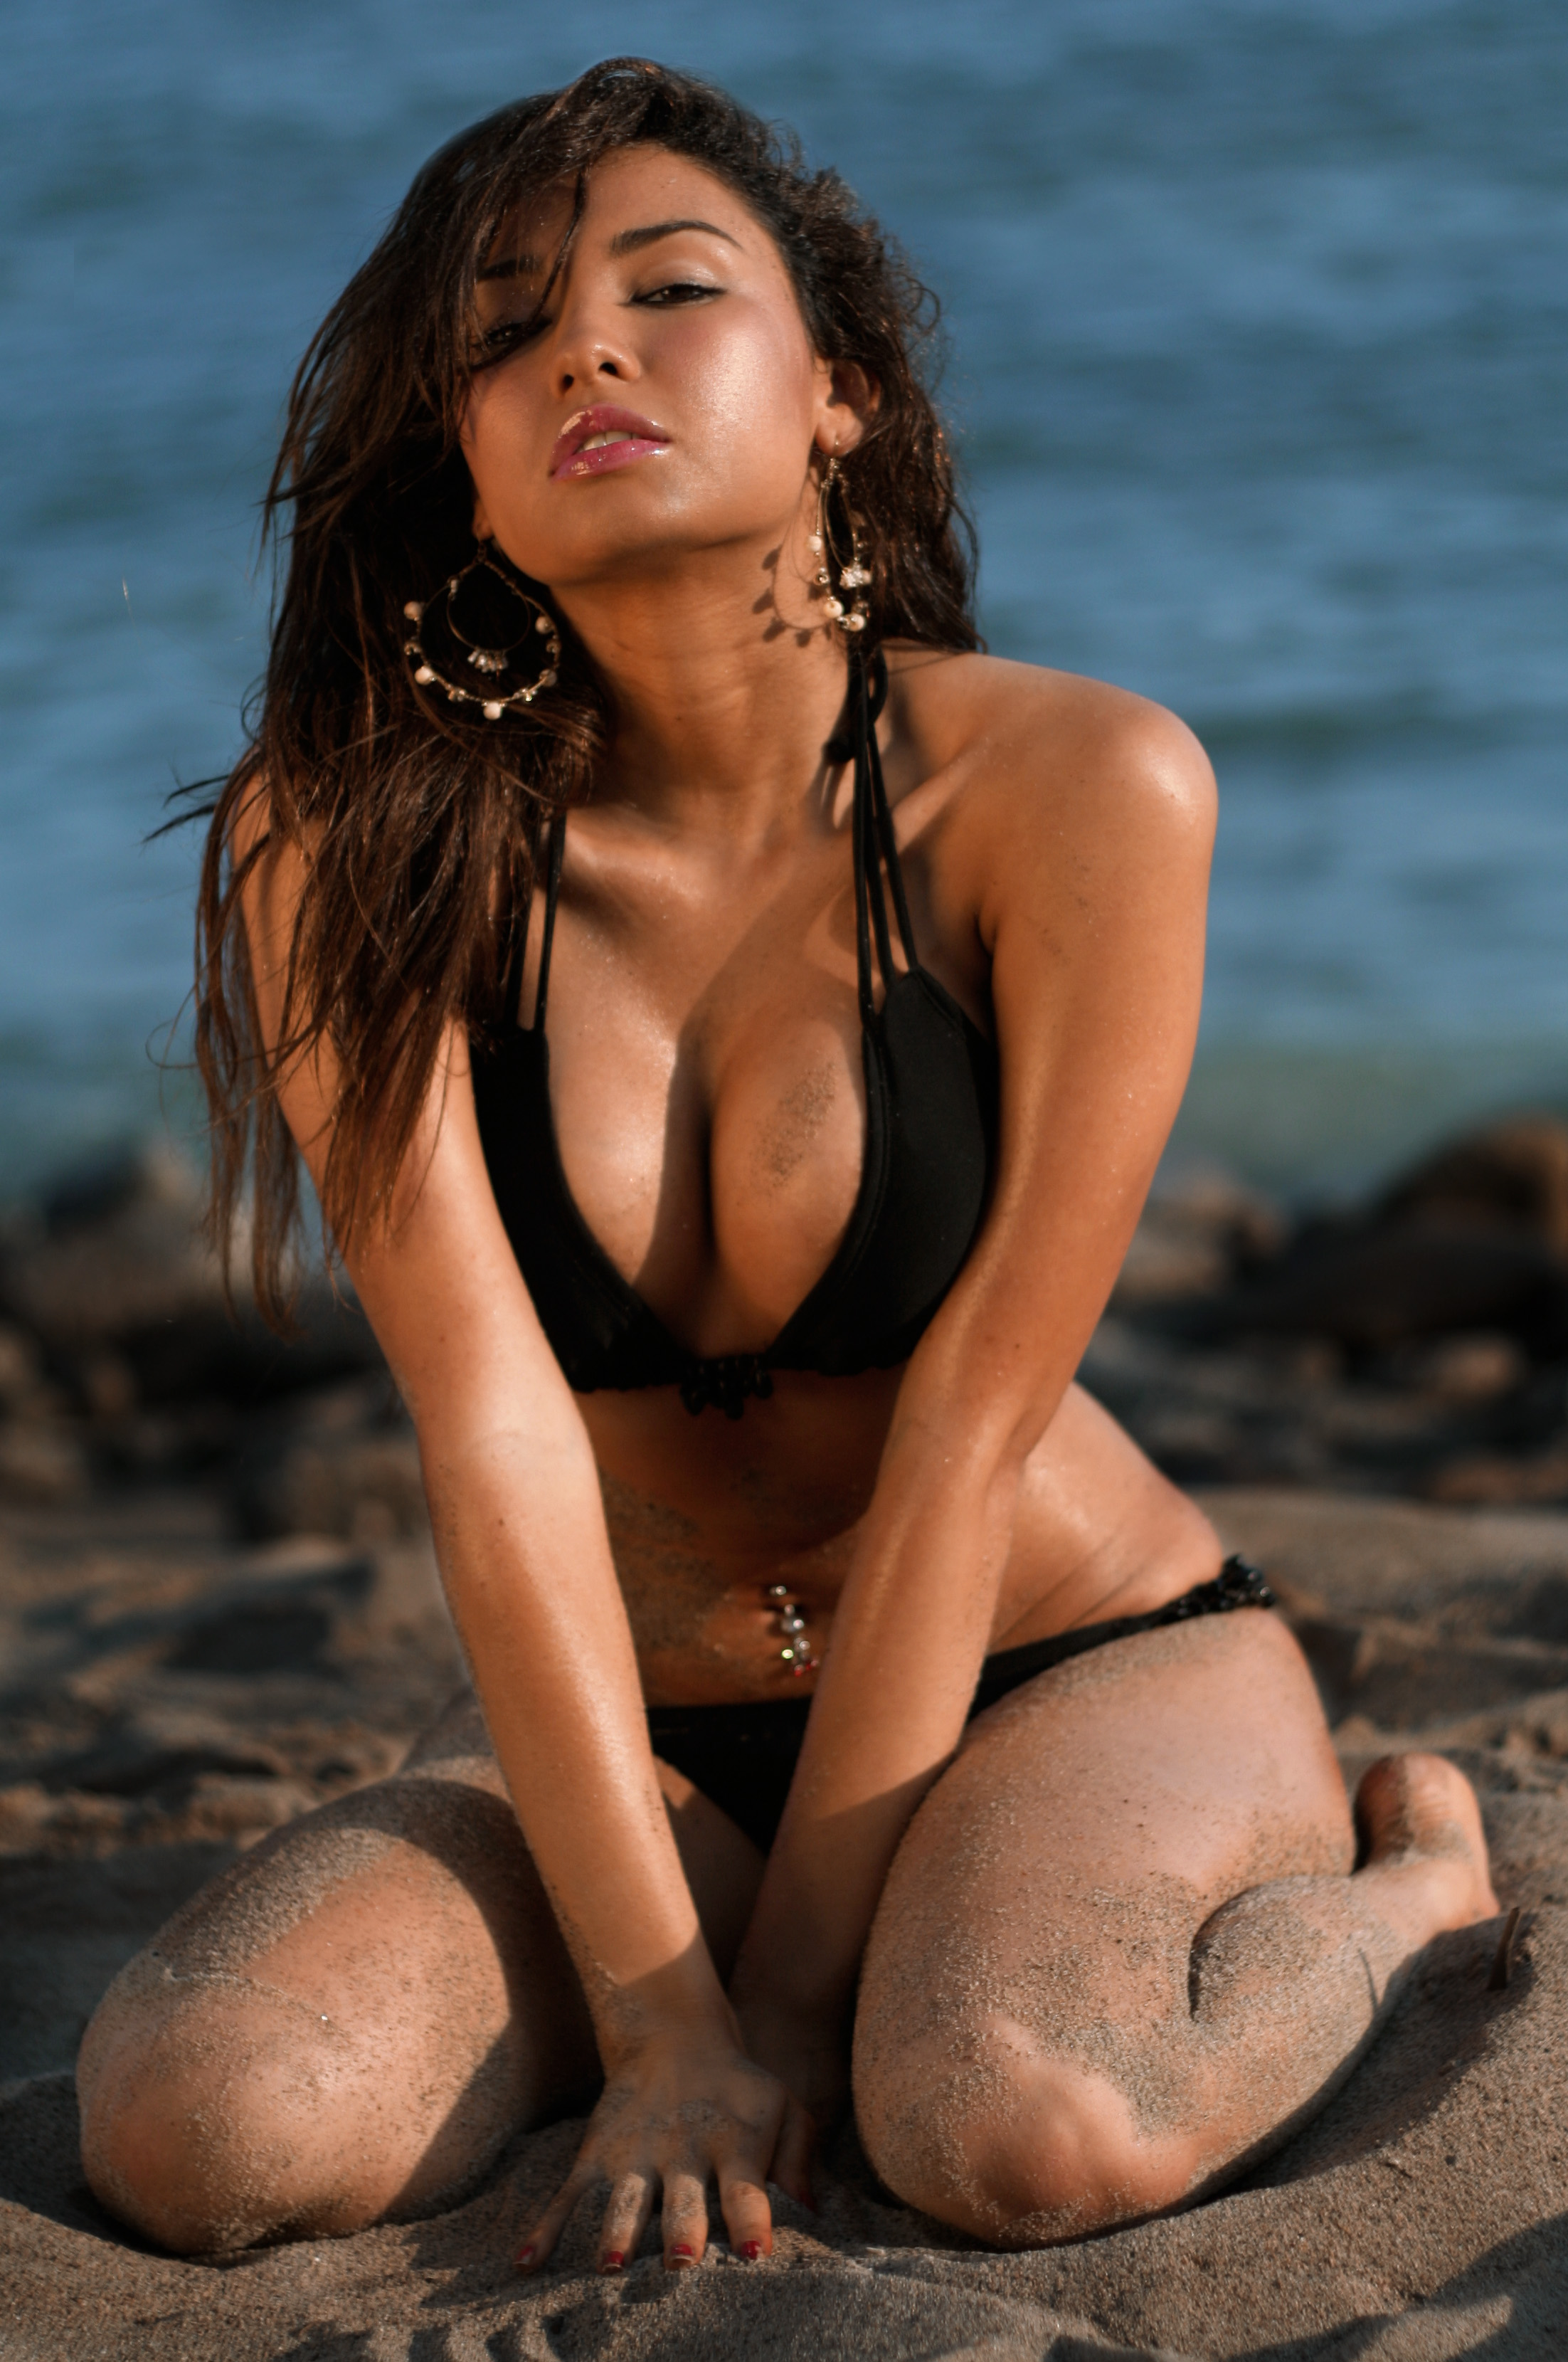 Description Jackie Martinez In A Black Bikini